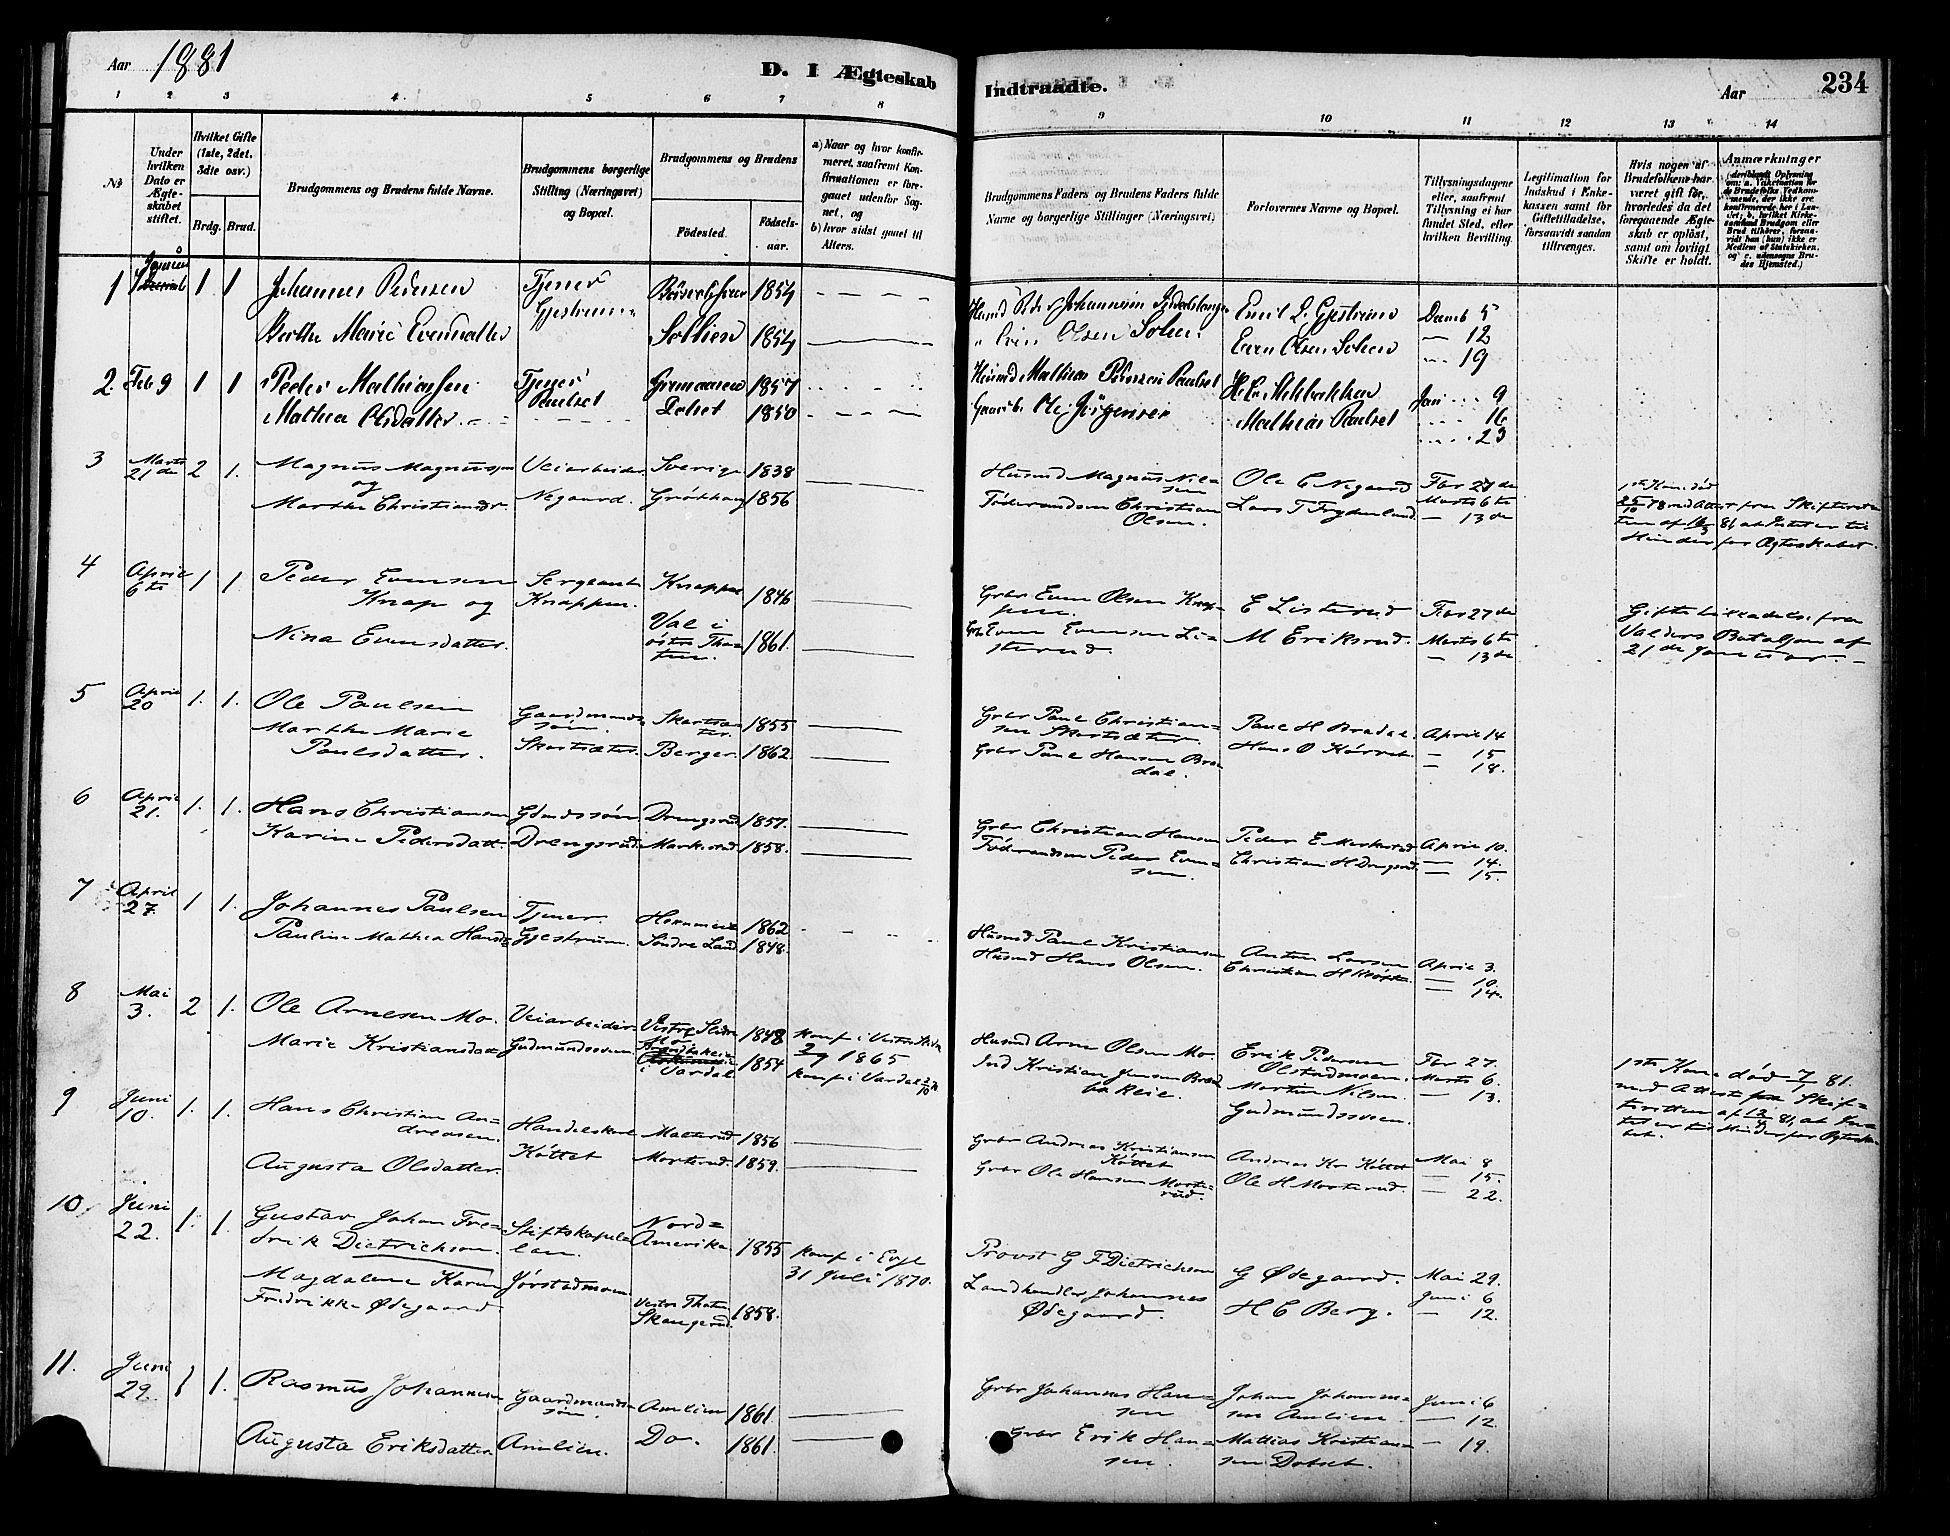 SAH, Vestre Toten prestekontor, H/Ha/Haa/L0009: Ministerialbok nr. 9, 1878-1894, s. 234